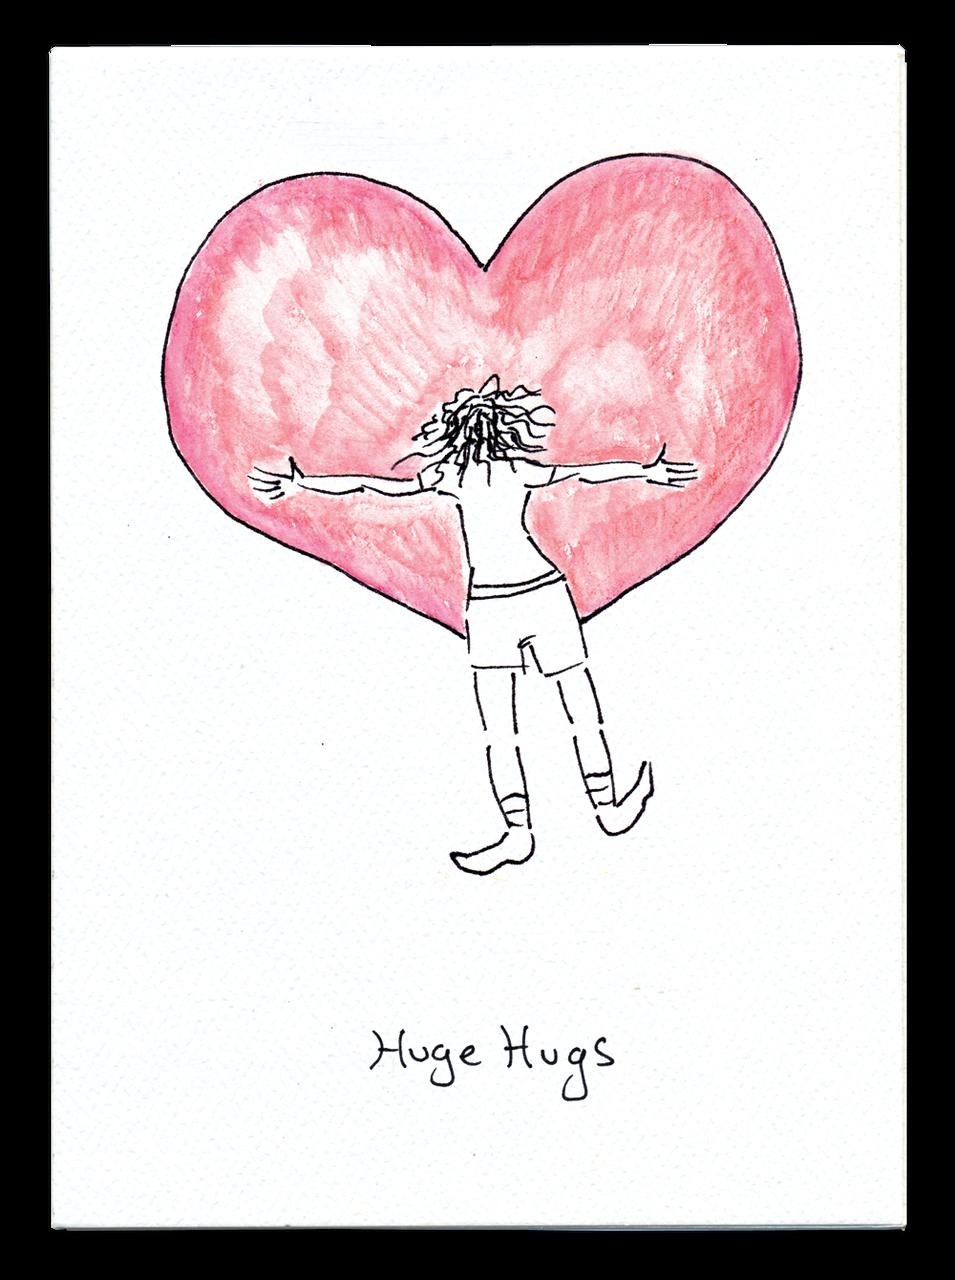 Huge Hugs